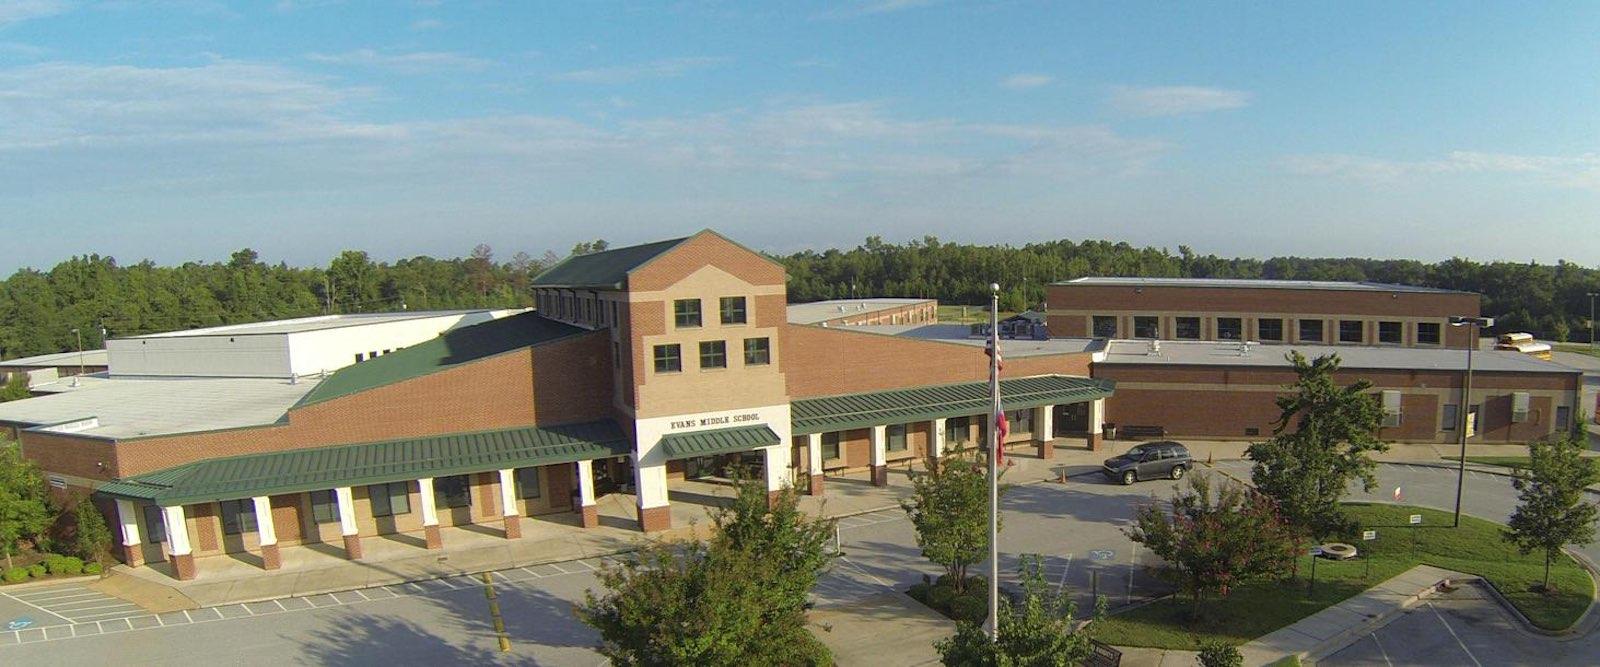 Evans Middle School